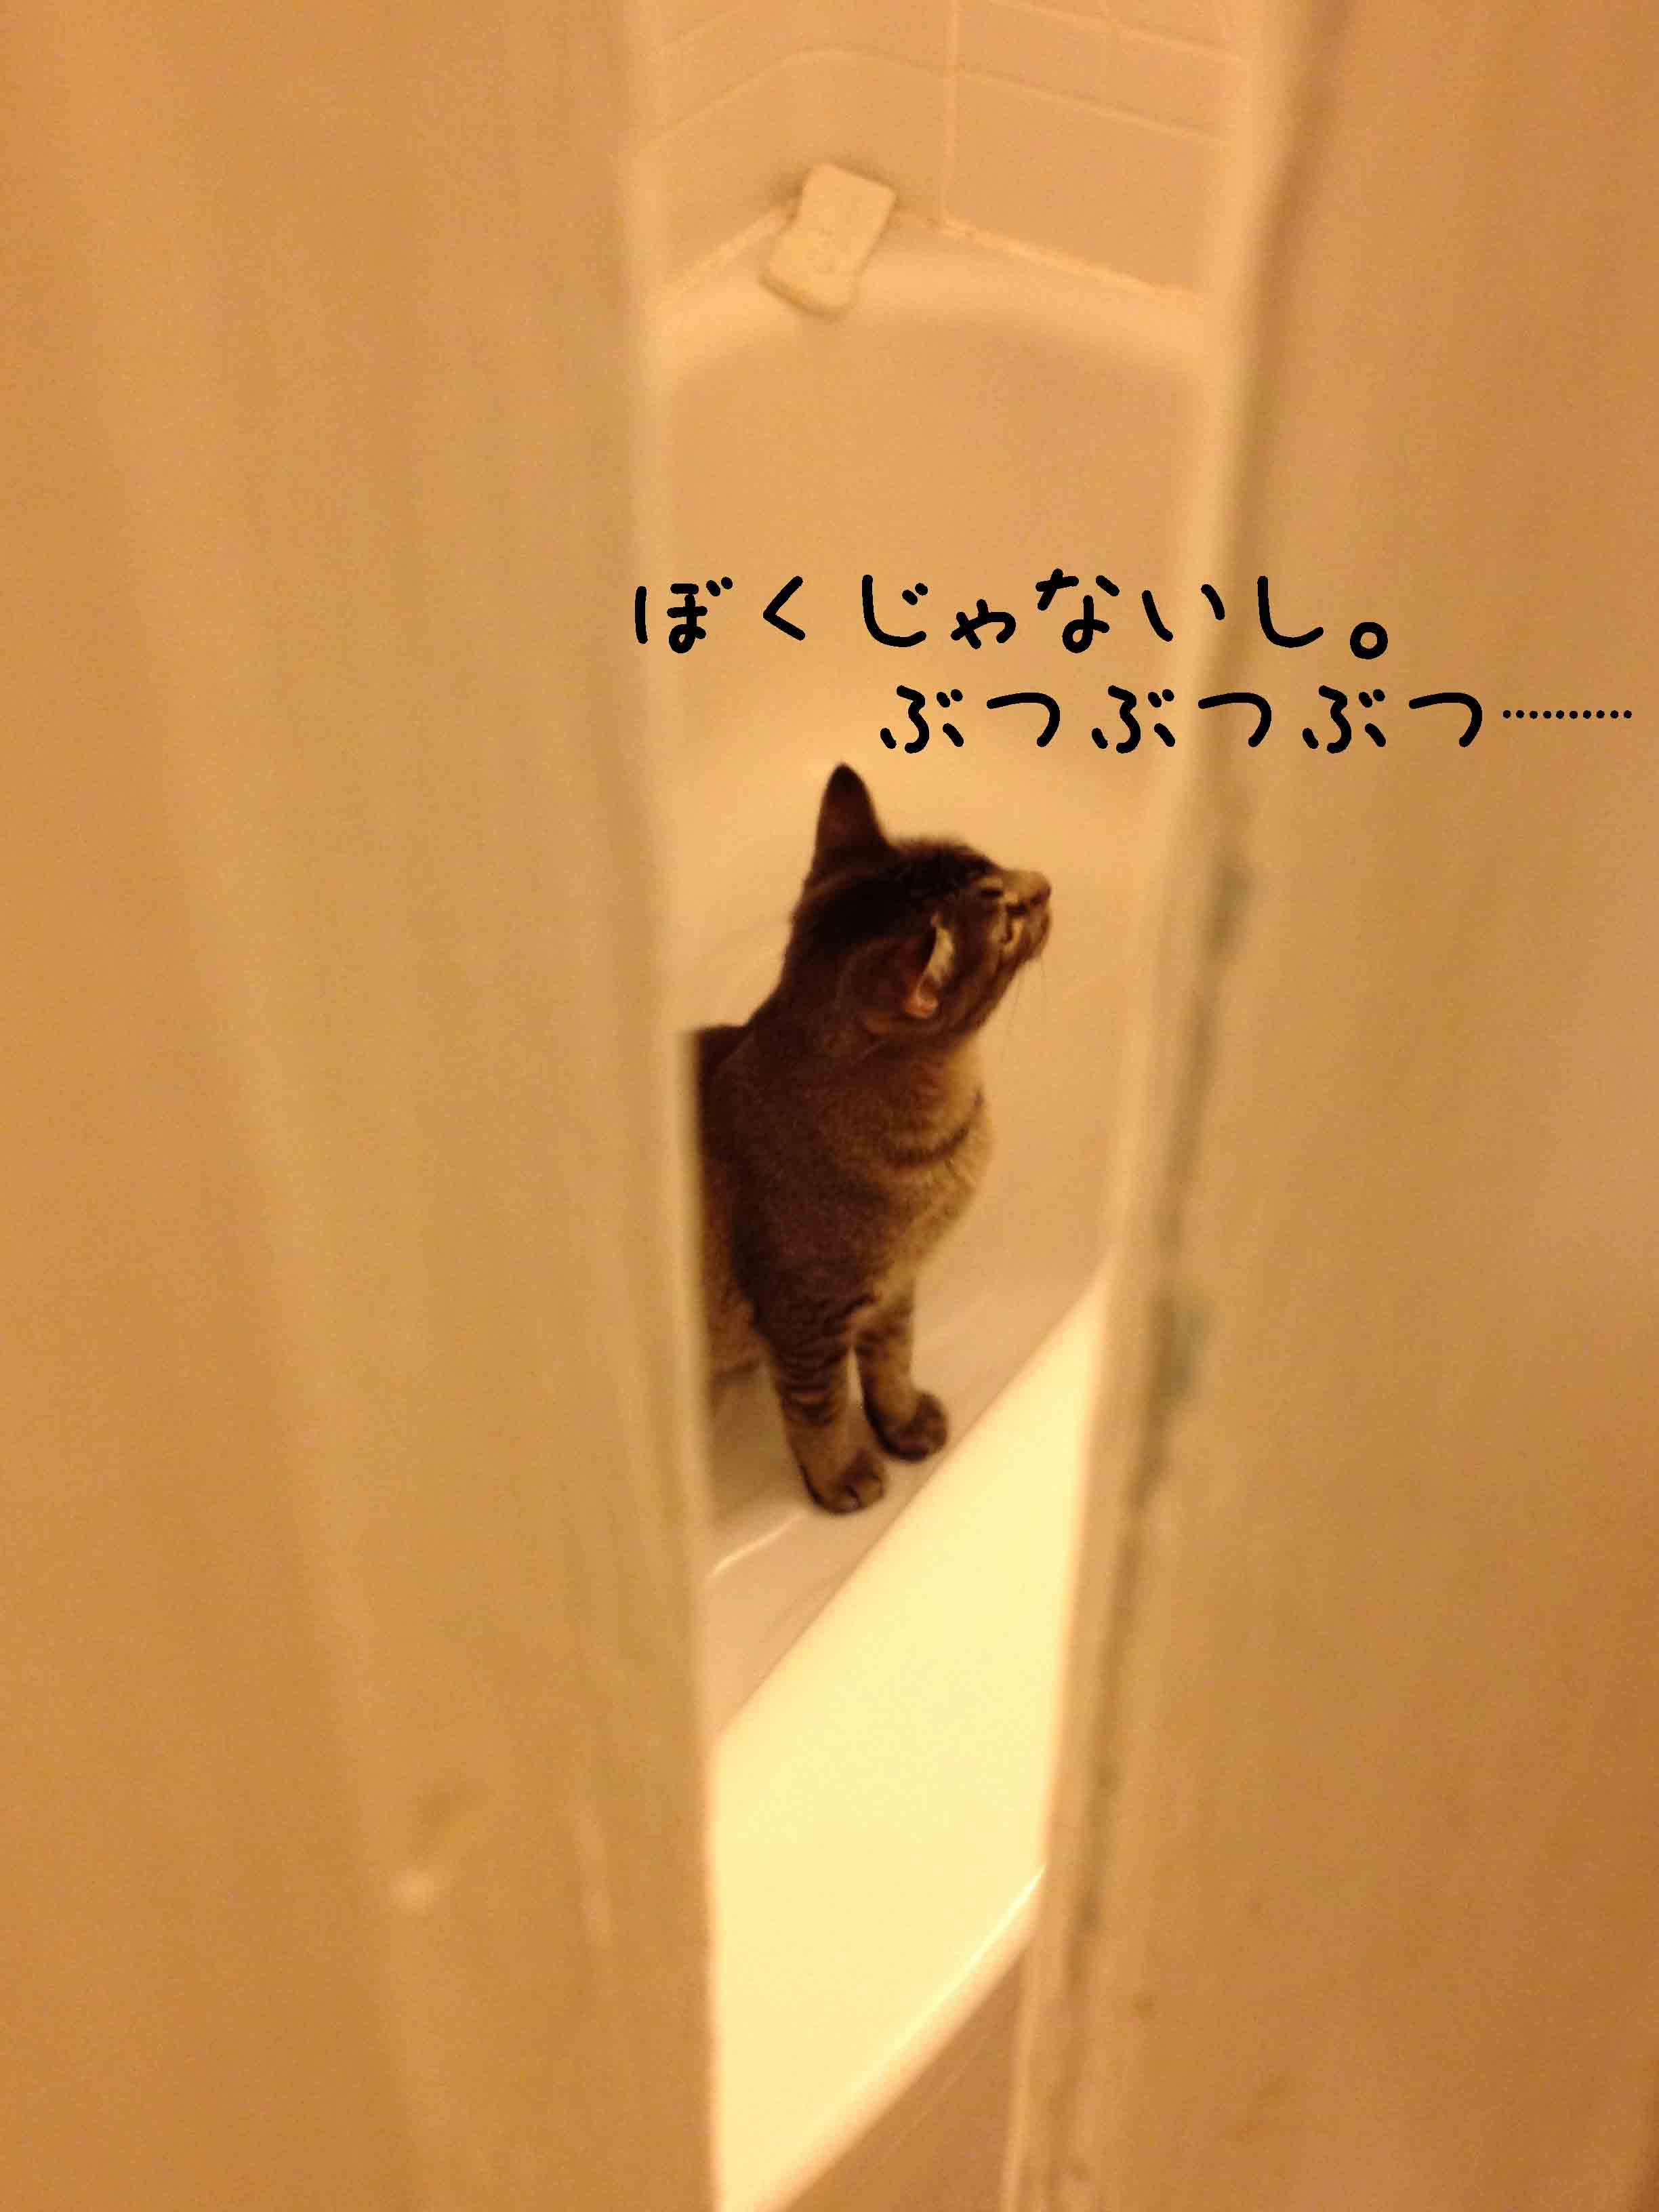 201209120320185c2.jpg